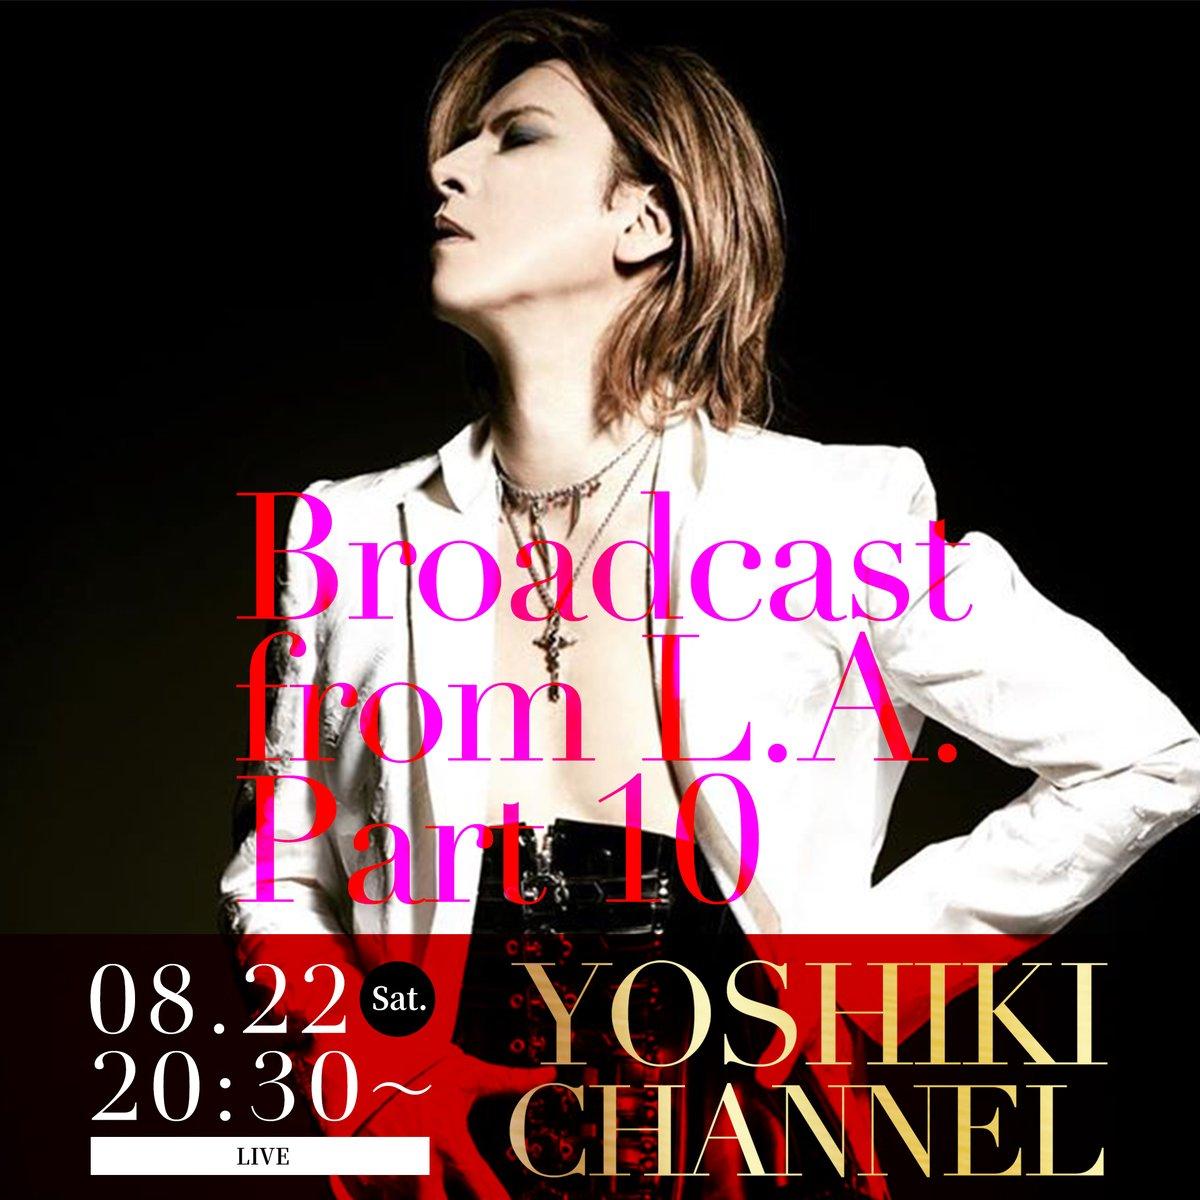 【8/22(Sat)20時30分~生放送決定】#YOSHIKI #LA より配信 -PART10- Japan → International→ @YoshikiOfficial